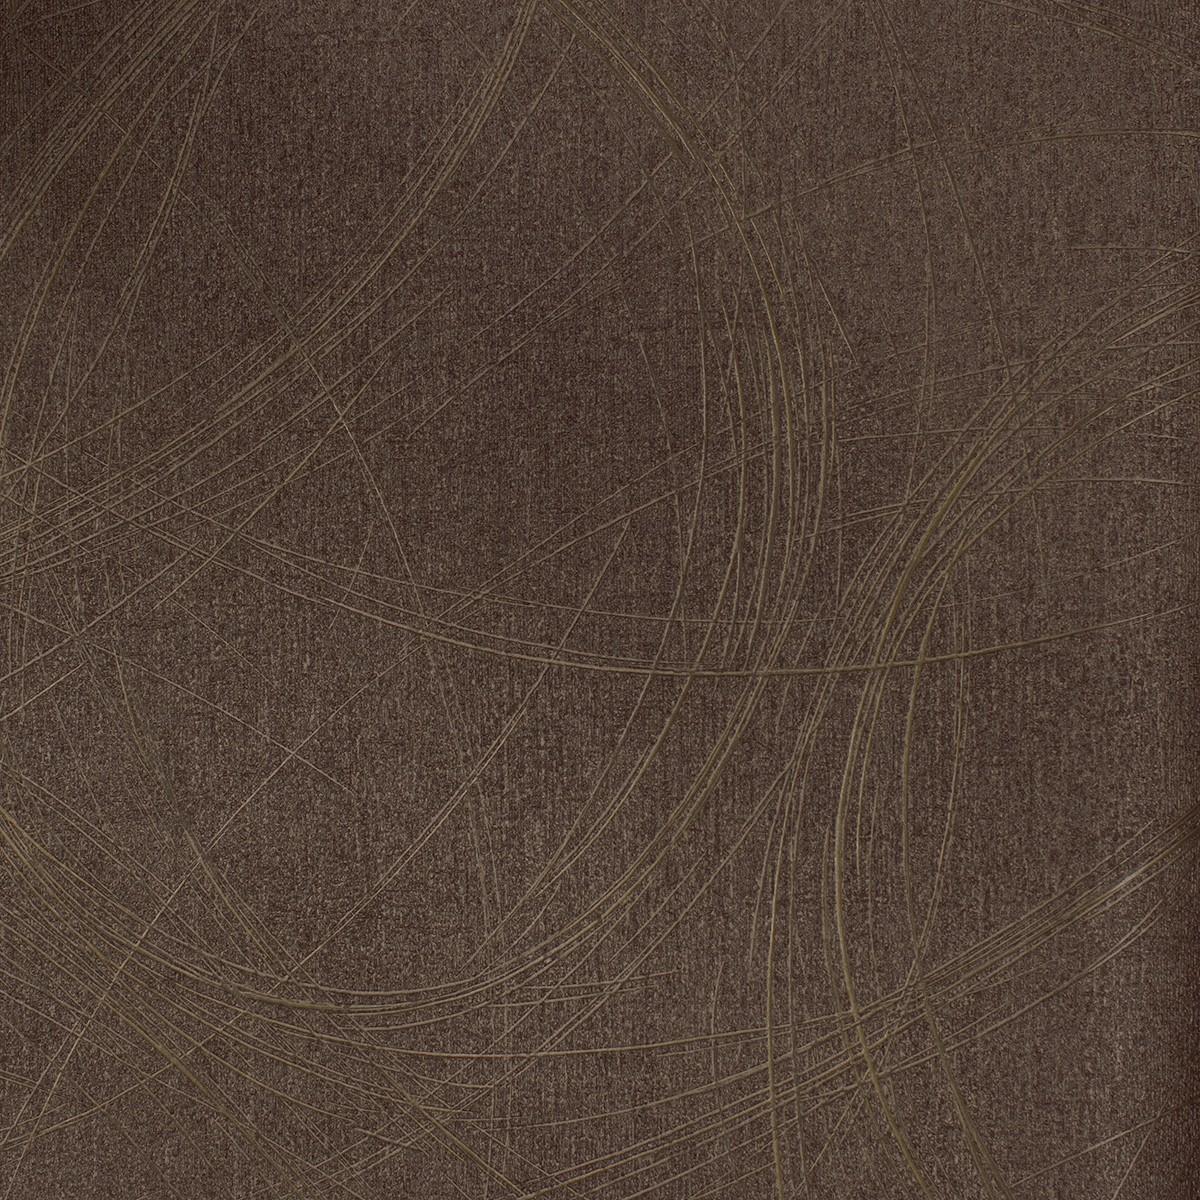 vliestapete luigi colani struktur braun gold 53323. Black Bedroom Furniture Sets. Home Design Ideas